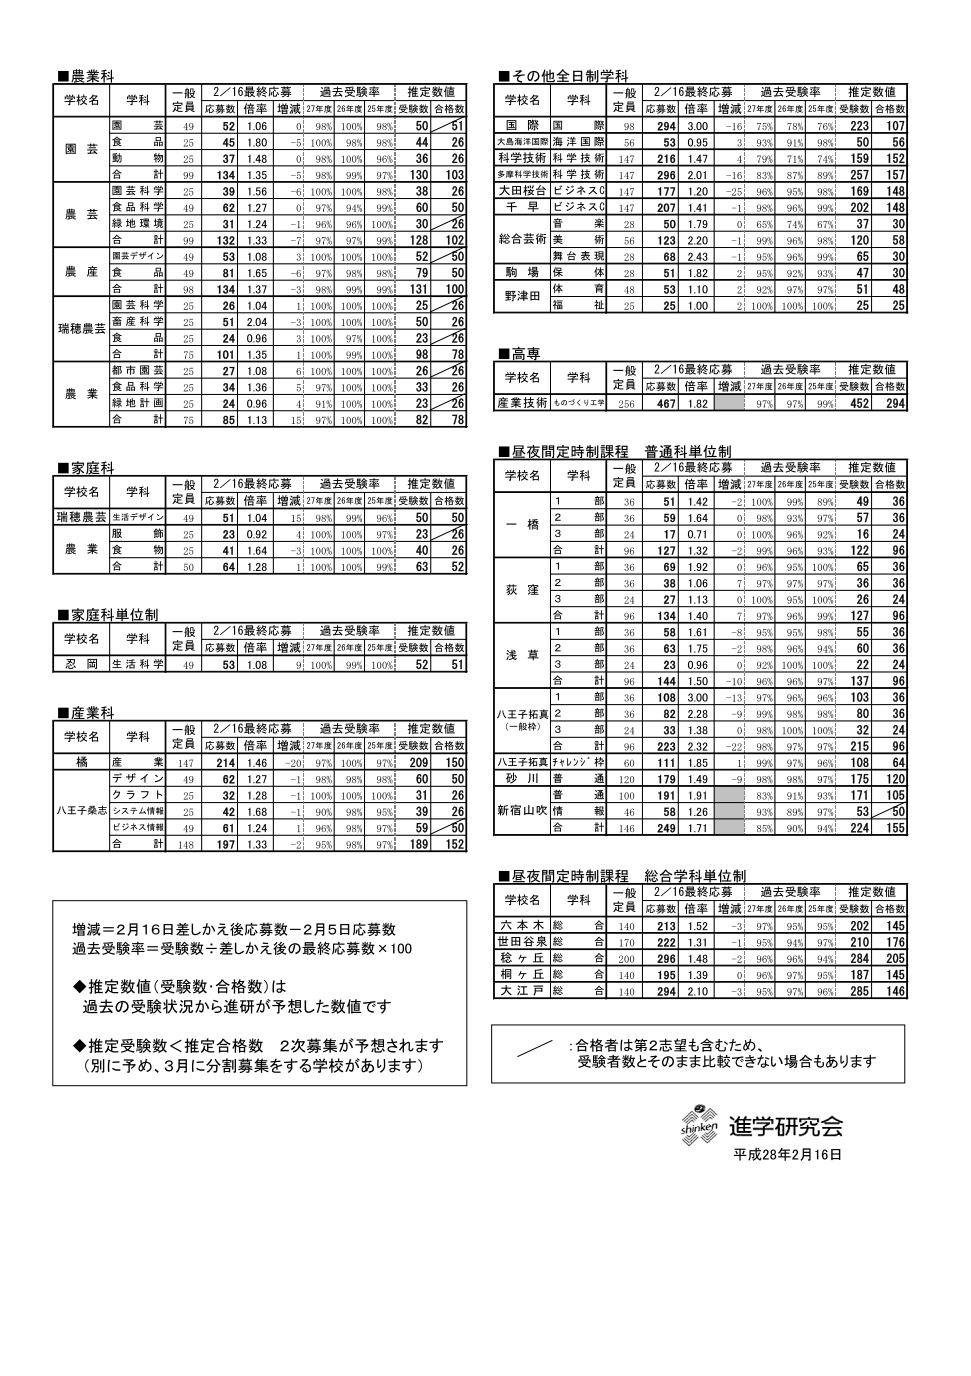 160216toritsu_senmon_02.png